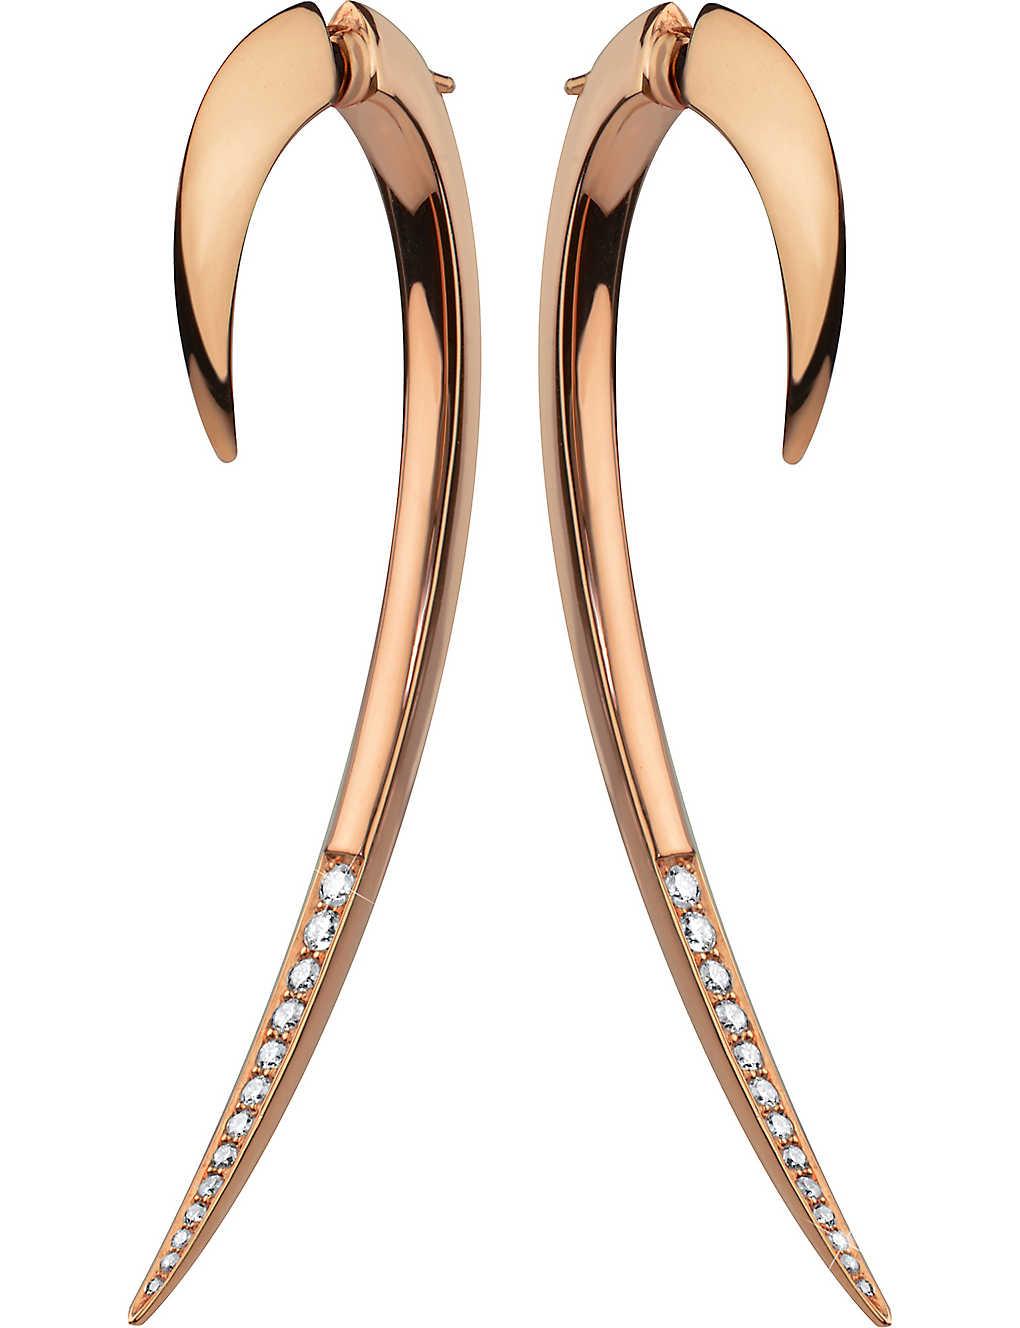 f582fc273 SHAUN LEANE - Tusk rose gold vermeil and diamond earrings ...